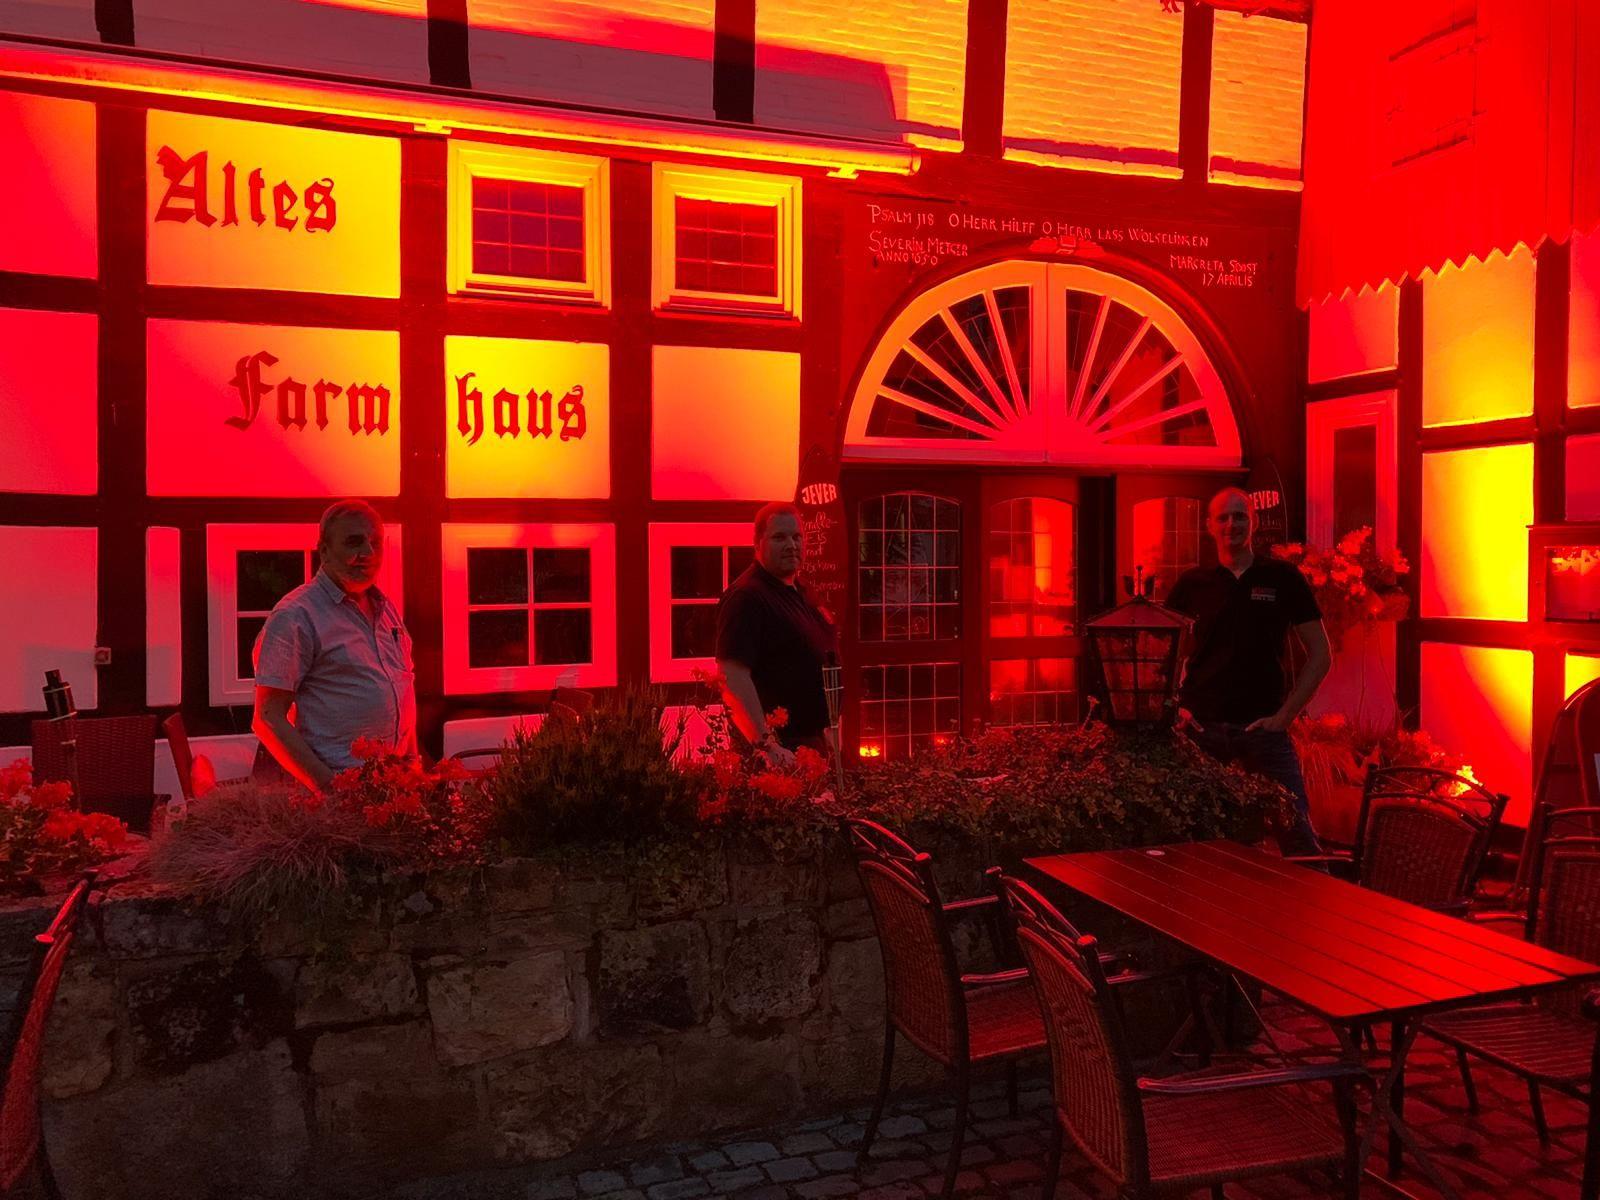 Altes Farmhaus in Bildern | Altes Farmhaus